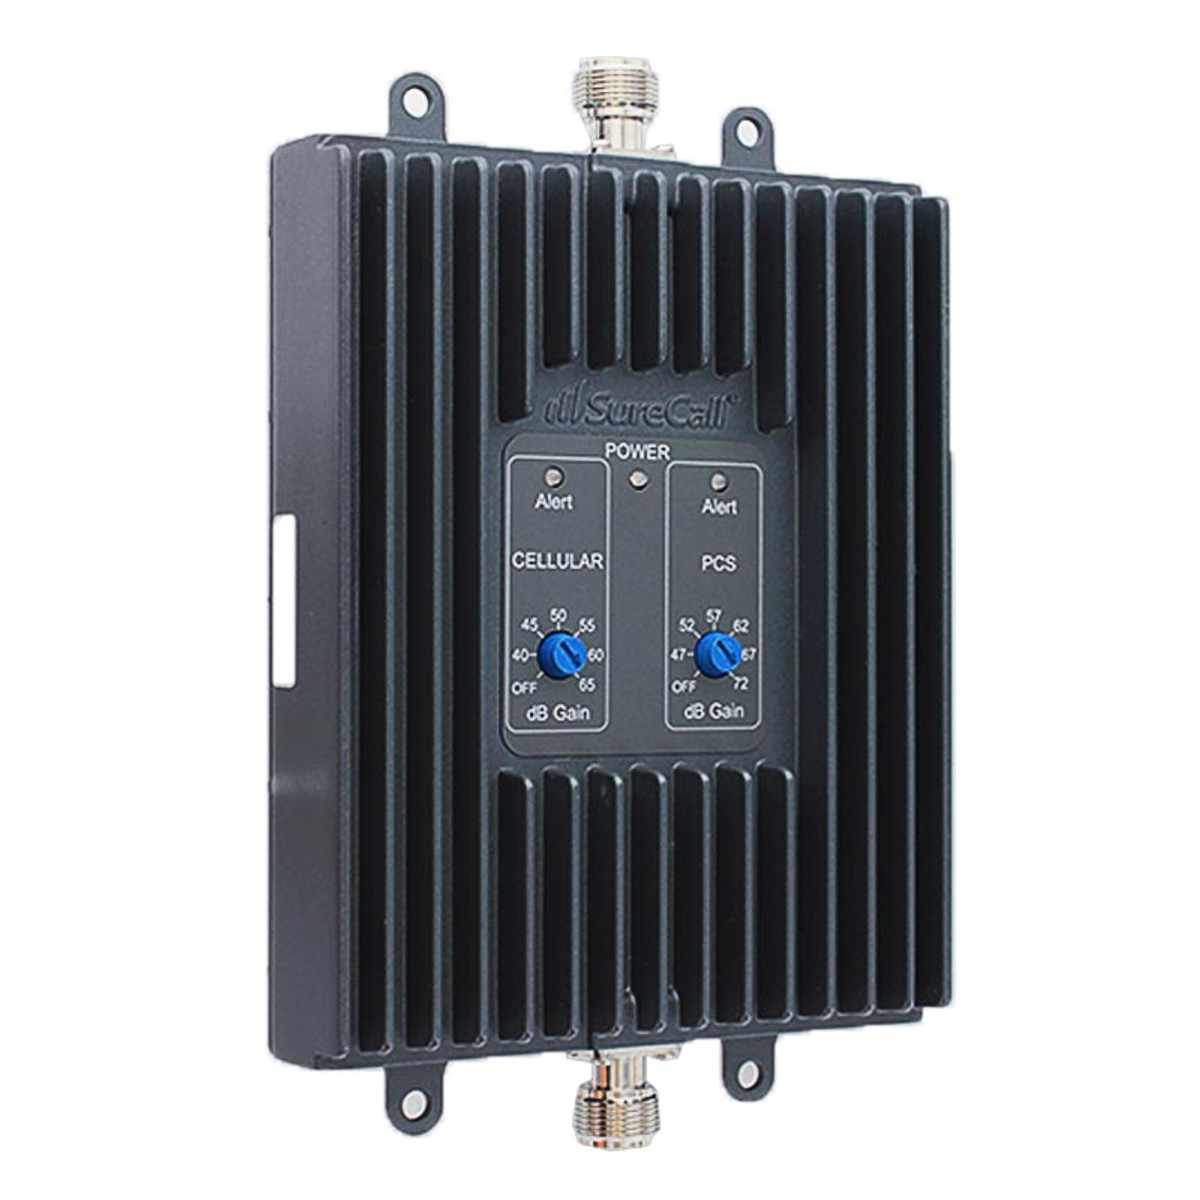 SureCall FlexPro 3G Signal Booster with Yagi & Whip Antennas | Alternative View